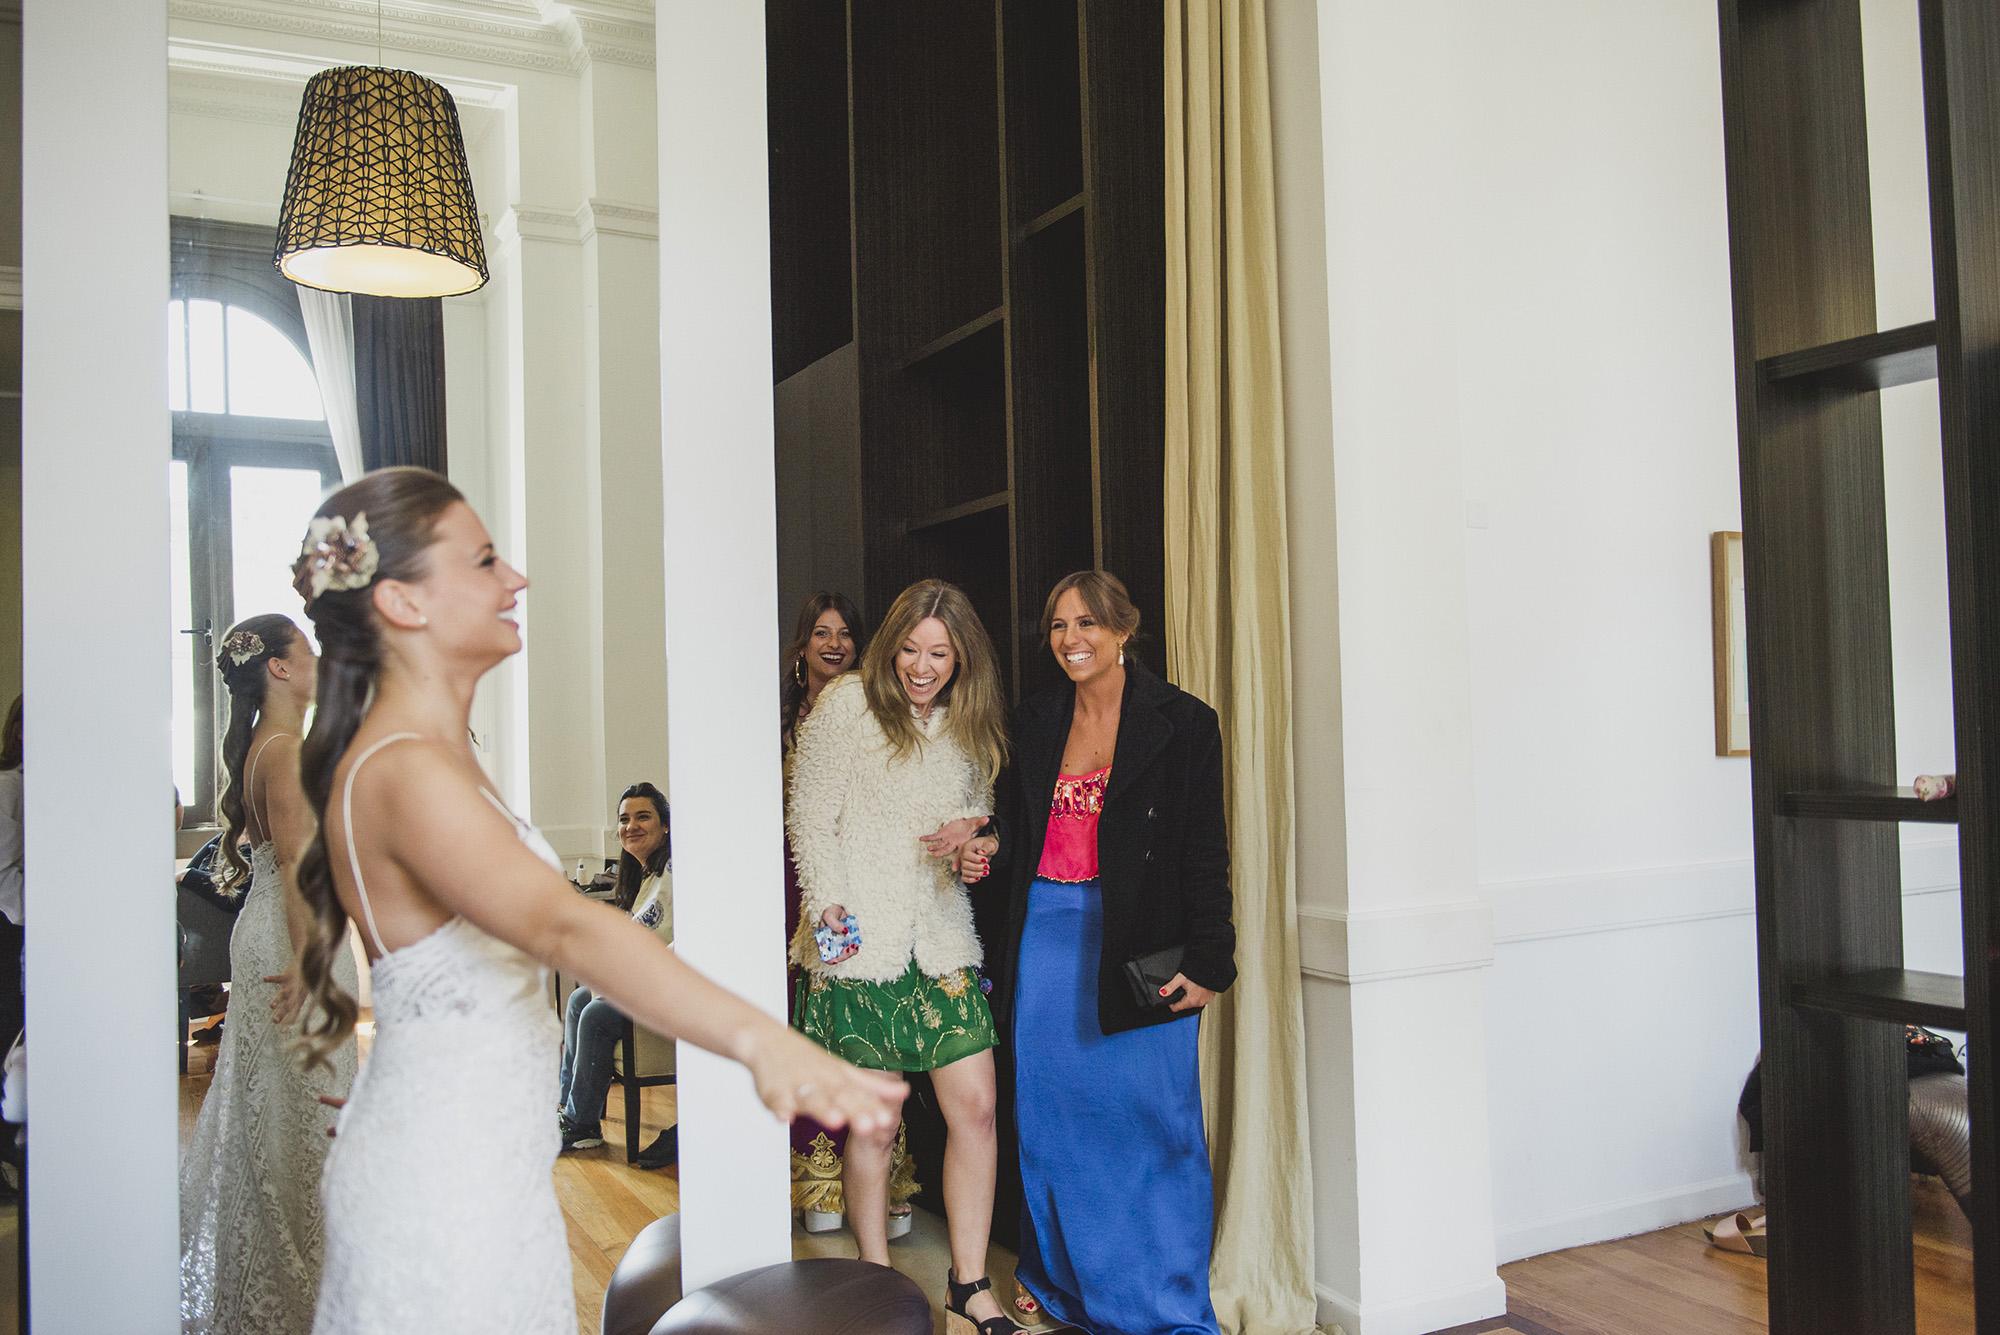 patricia-riba-casamiento-montevideo-uruguay-lindolfo-22